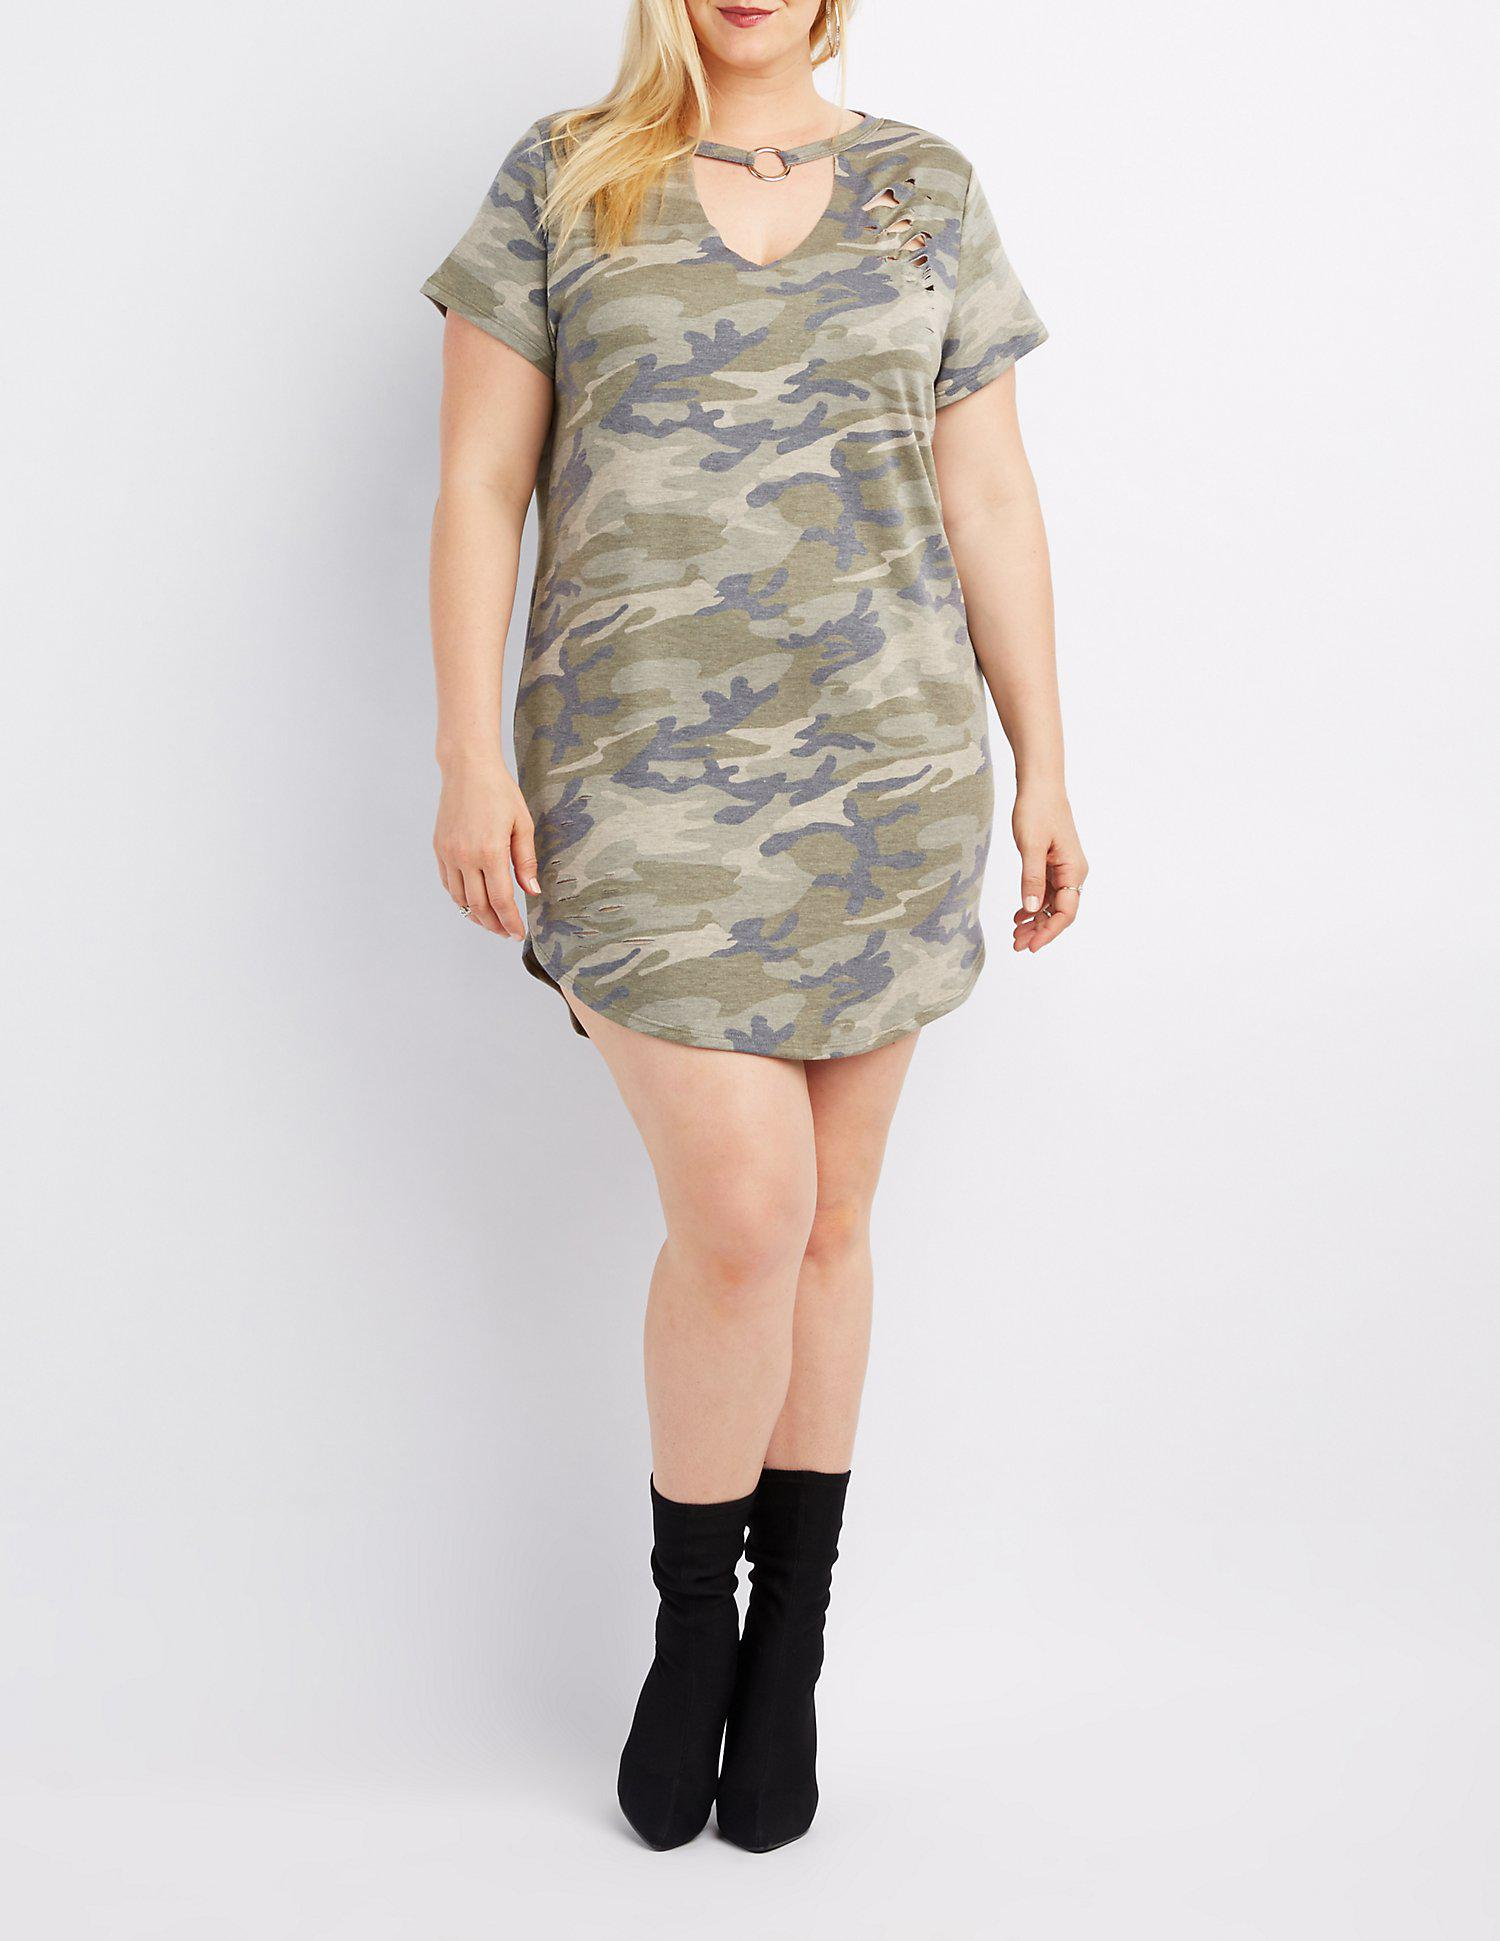 a32b25035f5 Lyst - Charlotte Russe Plus Size Camo O-ring T-shirt Dress